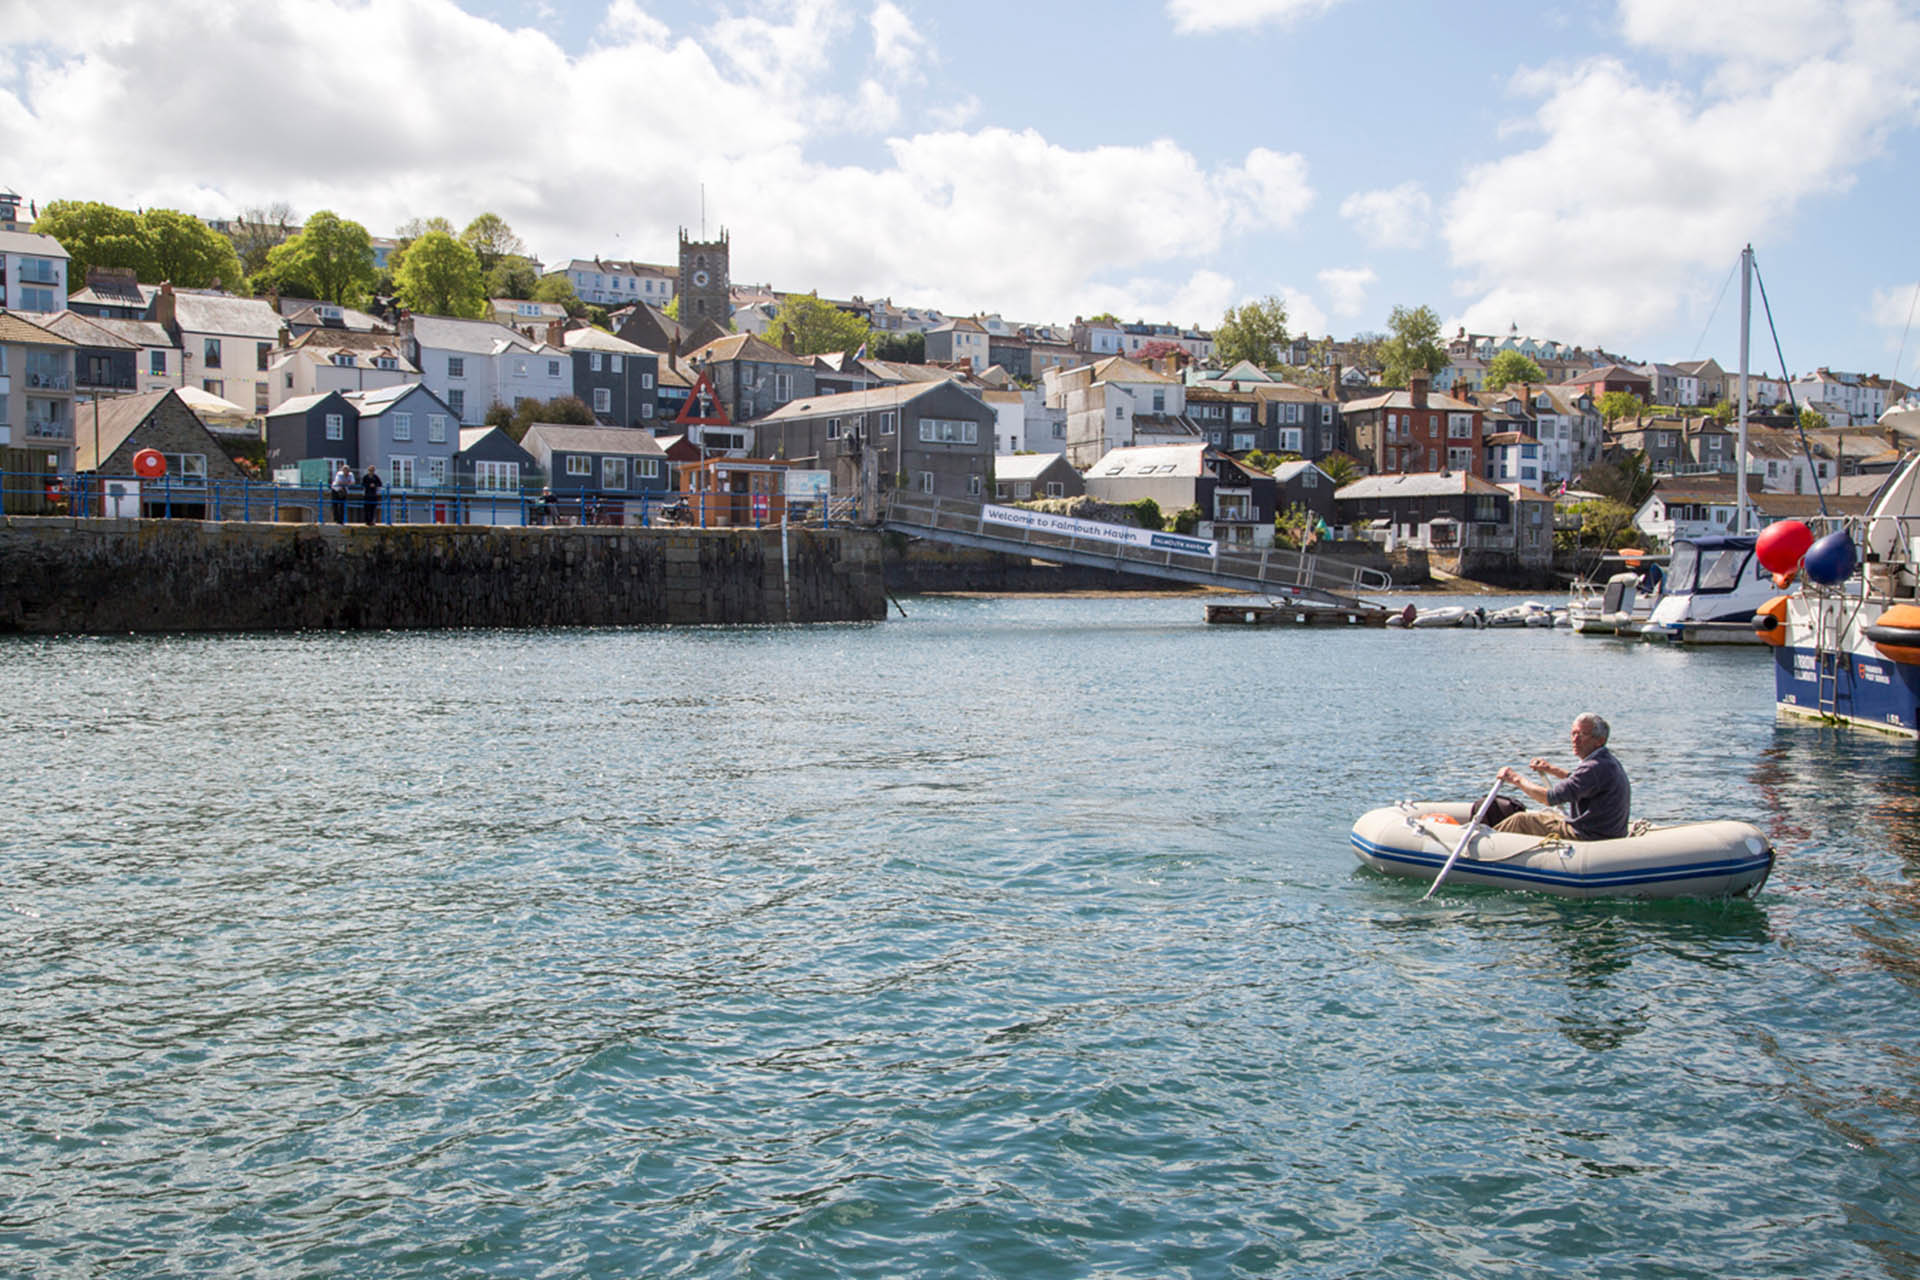 Falmouth-Haven-marina-pontoon-access